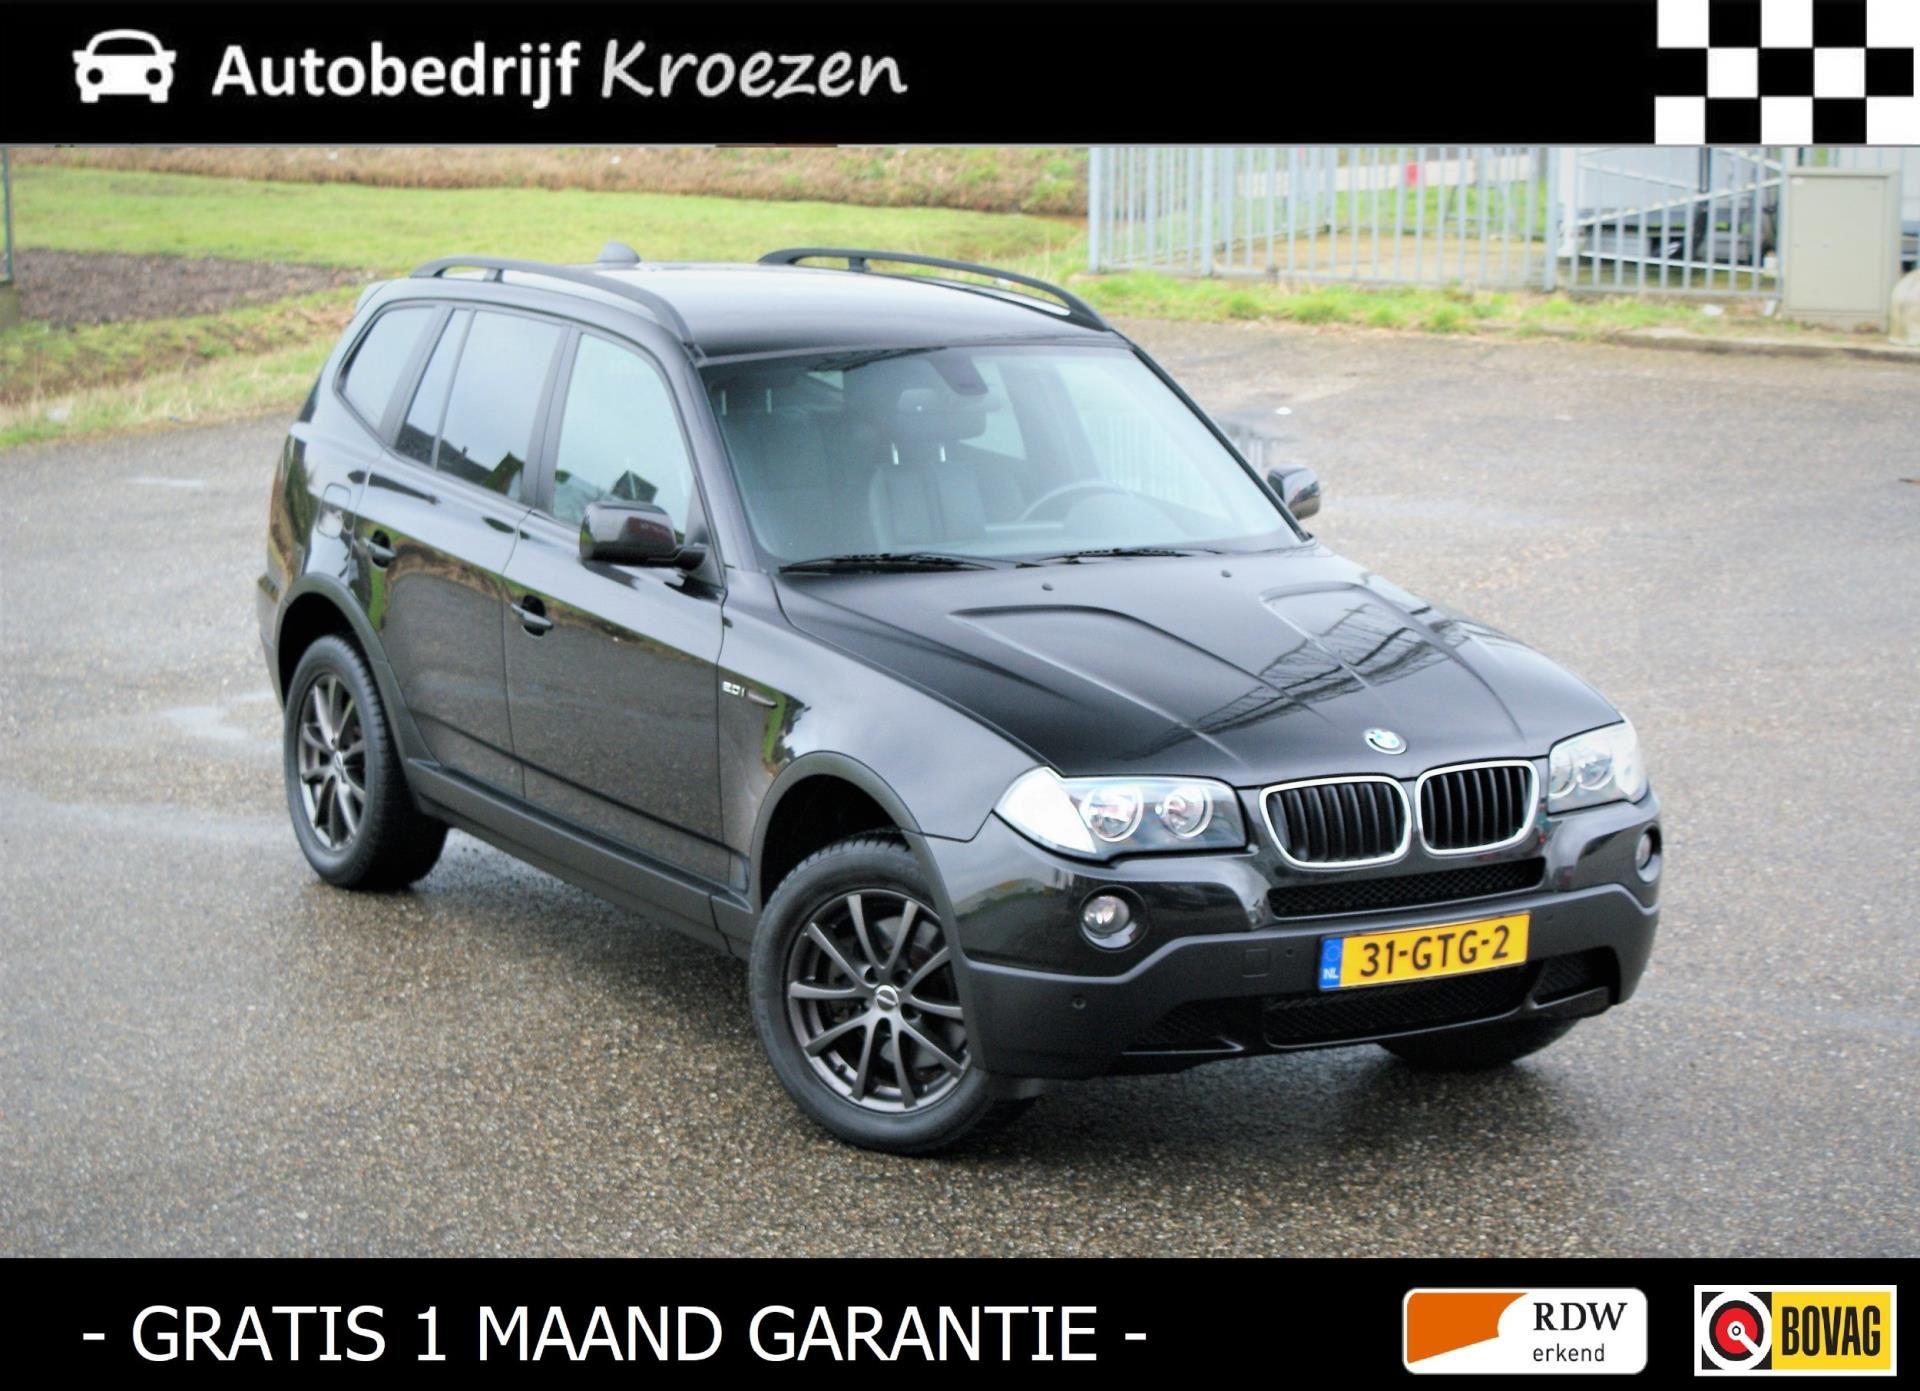 BMW X3 occasion - Autobedrijf Kroezen